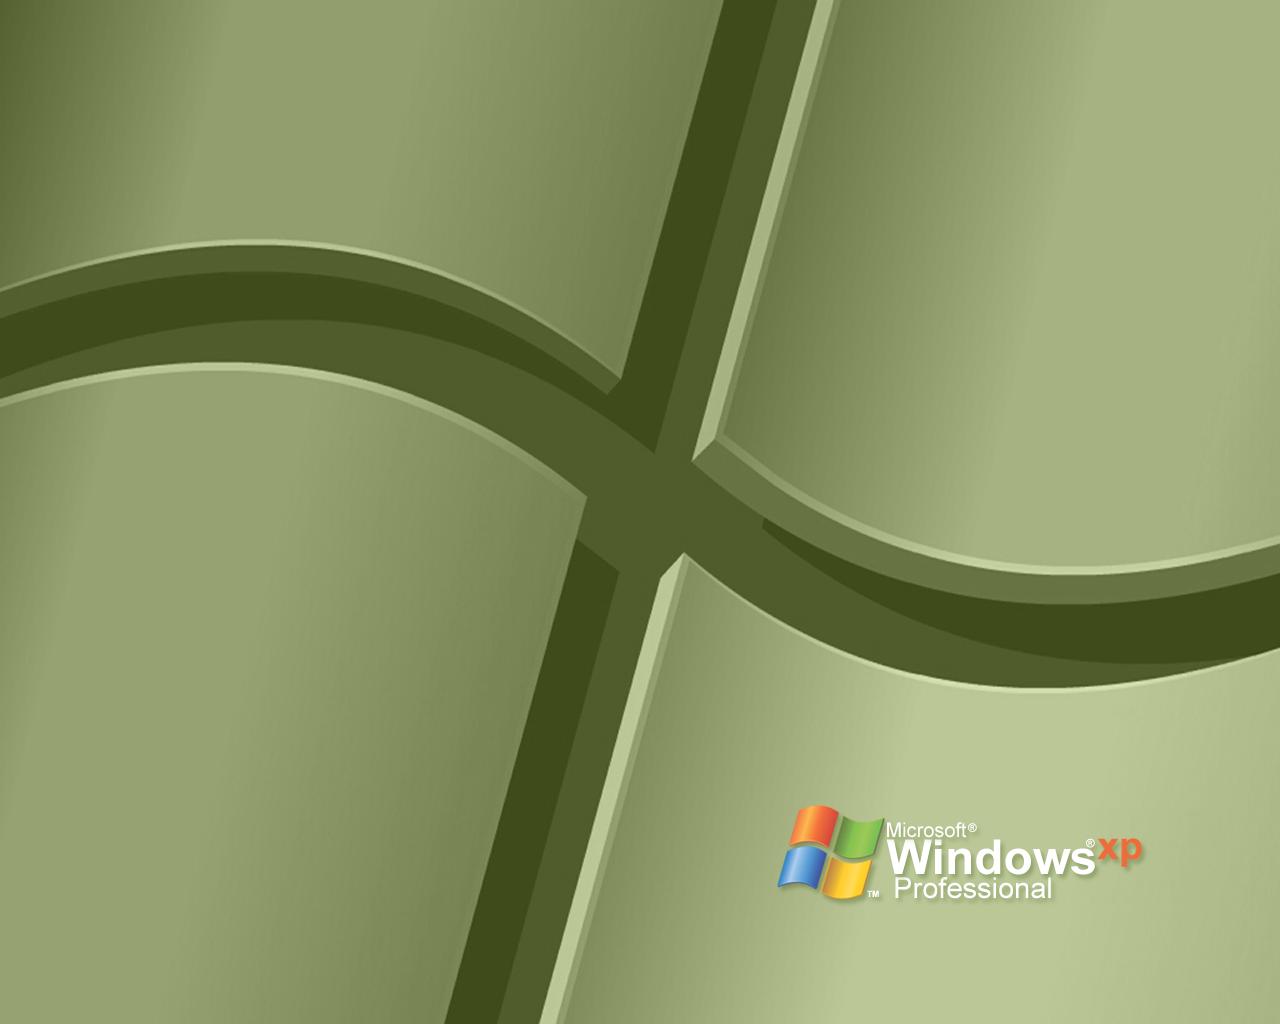 microsoft windows xp olive by radishtm on deviantart